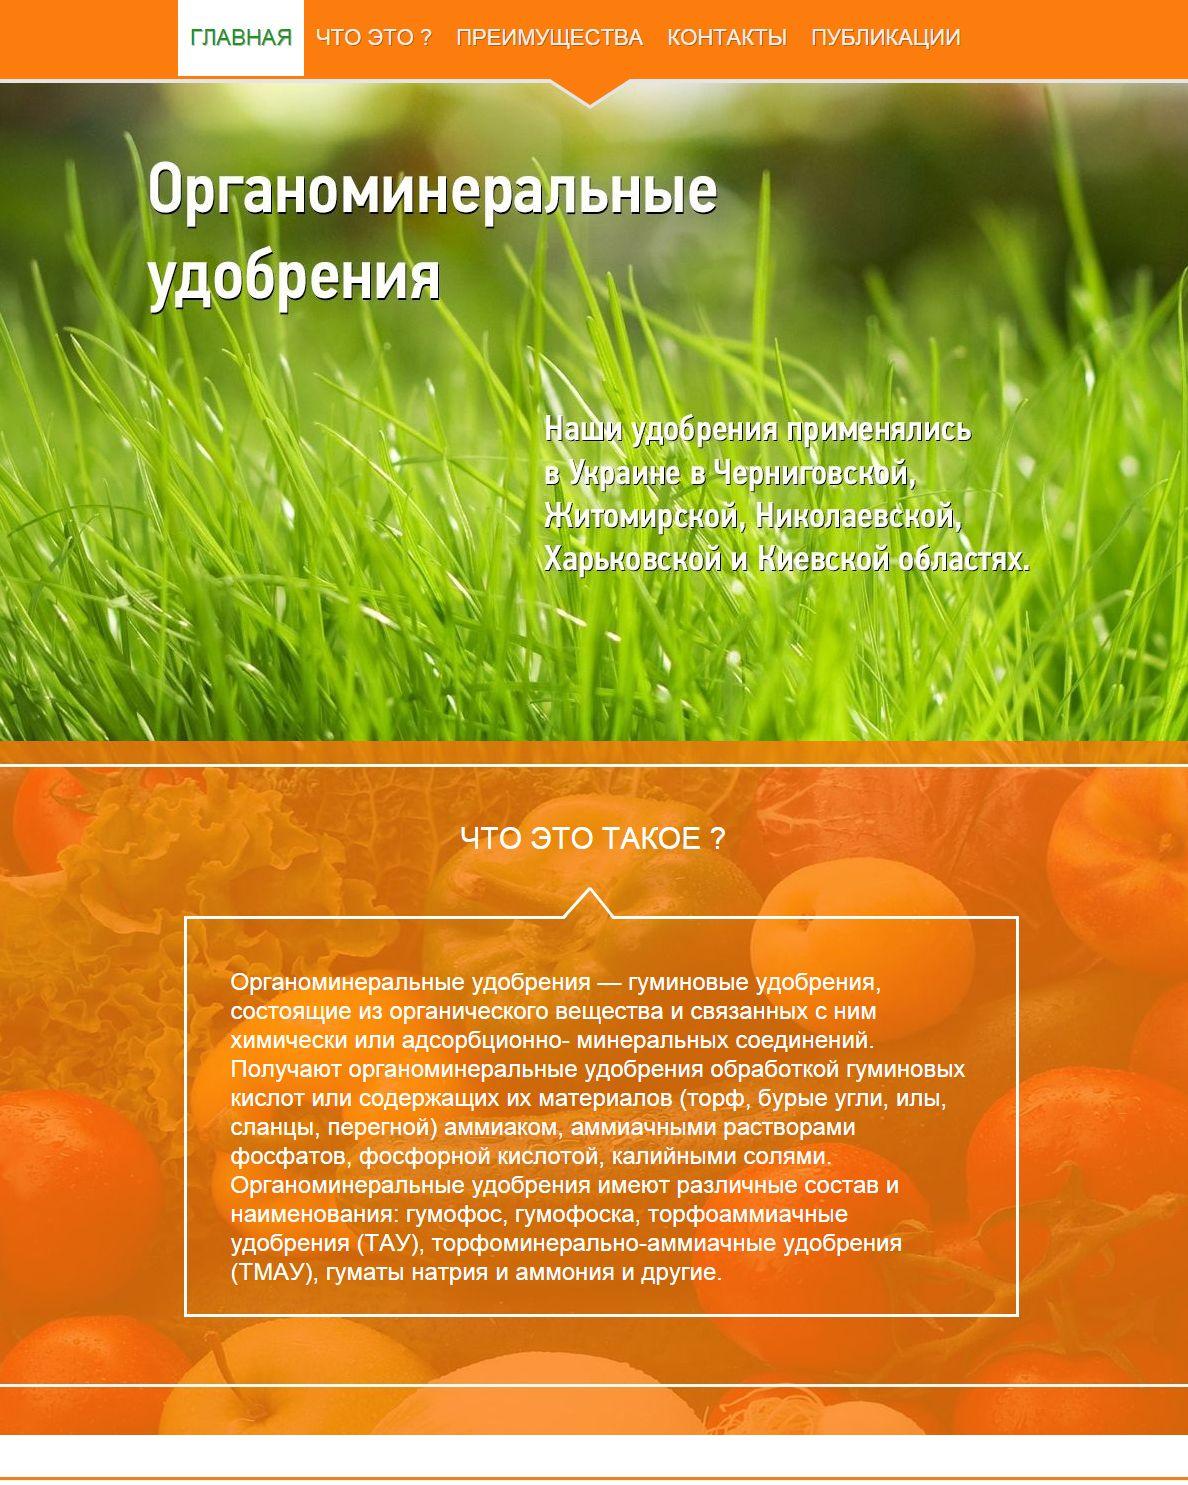 Web-дизайн, разработка сайта, верстка, поддержка